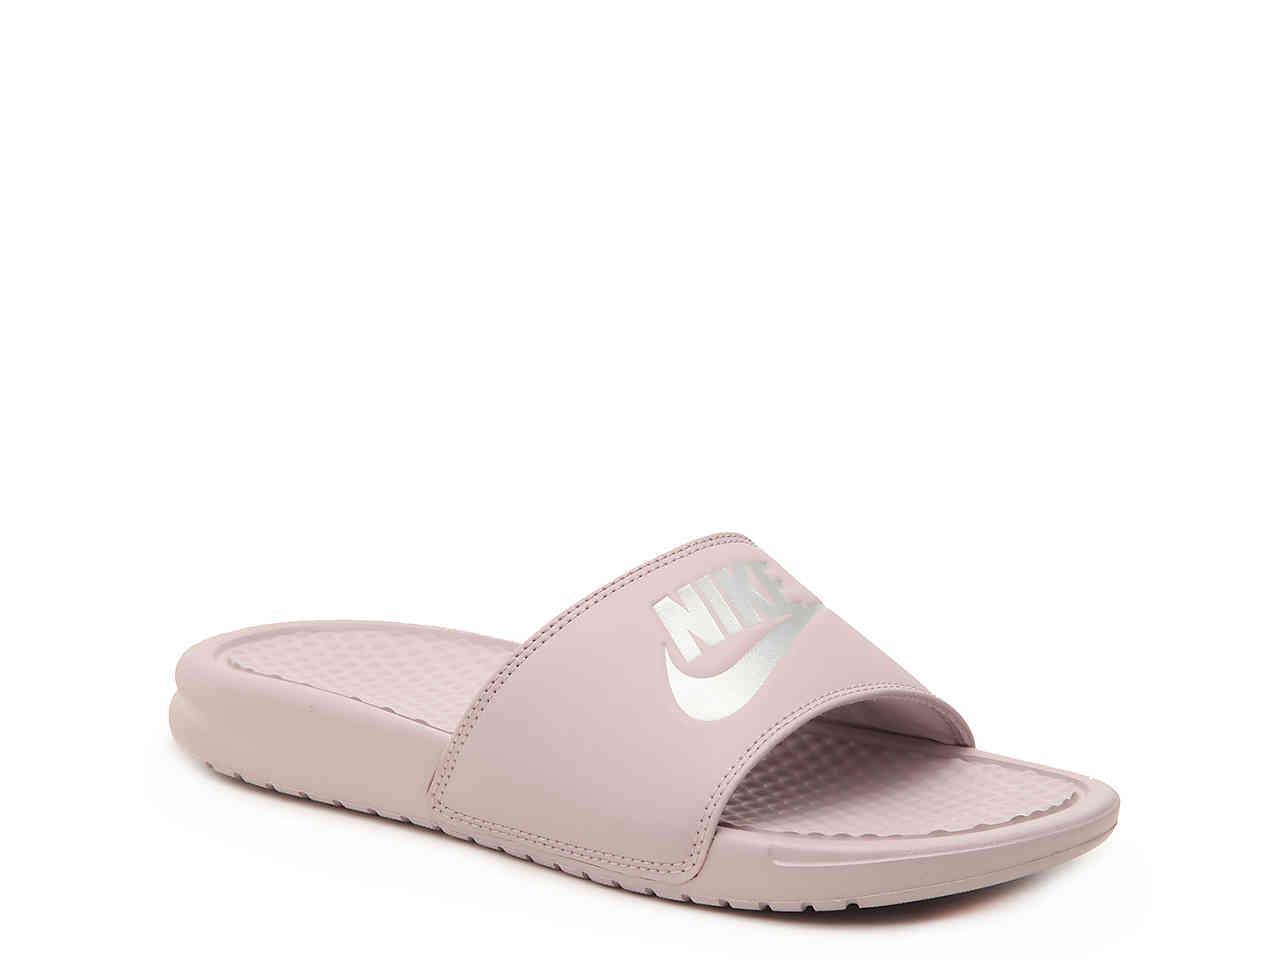 edd4b9ebb Lyst - Nike Benassi Slide Sandal in Pink - Save 4%